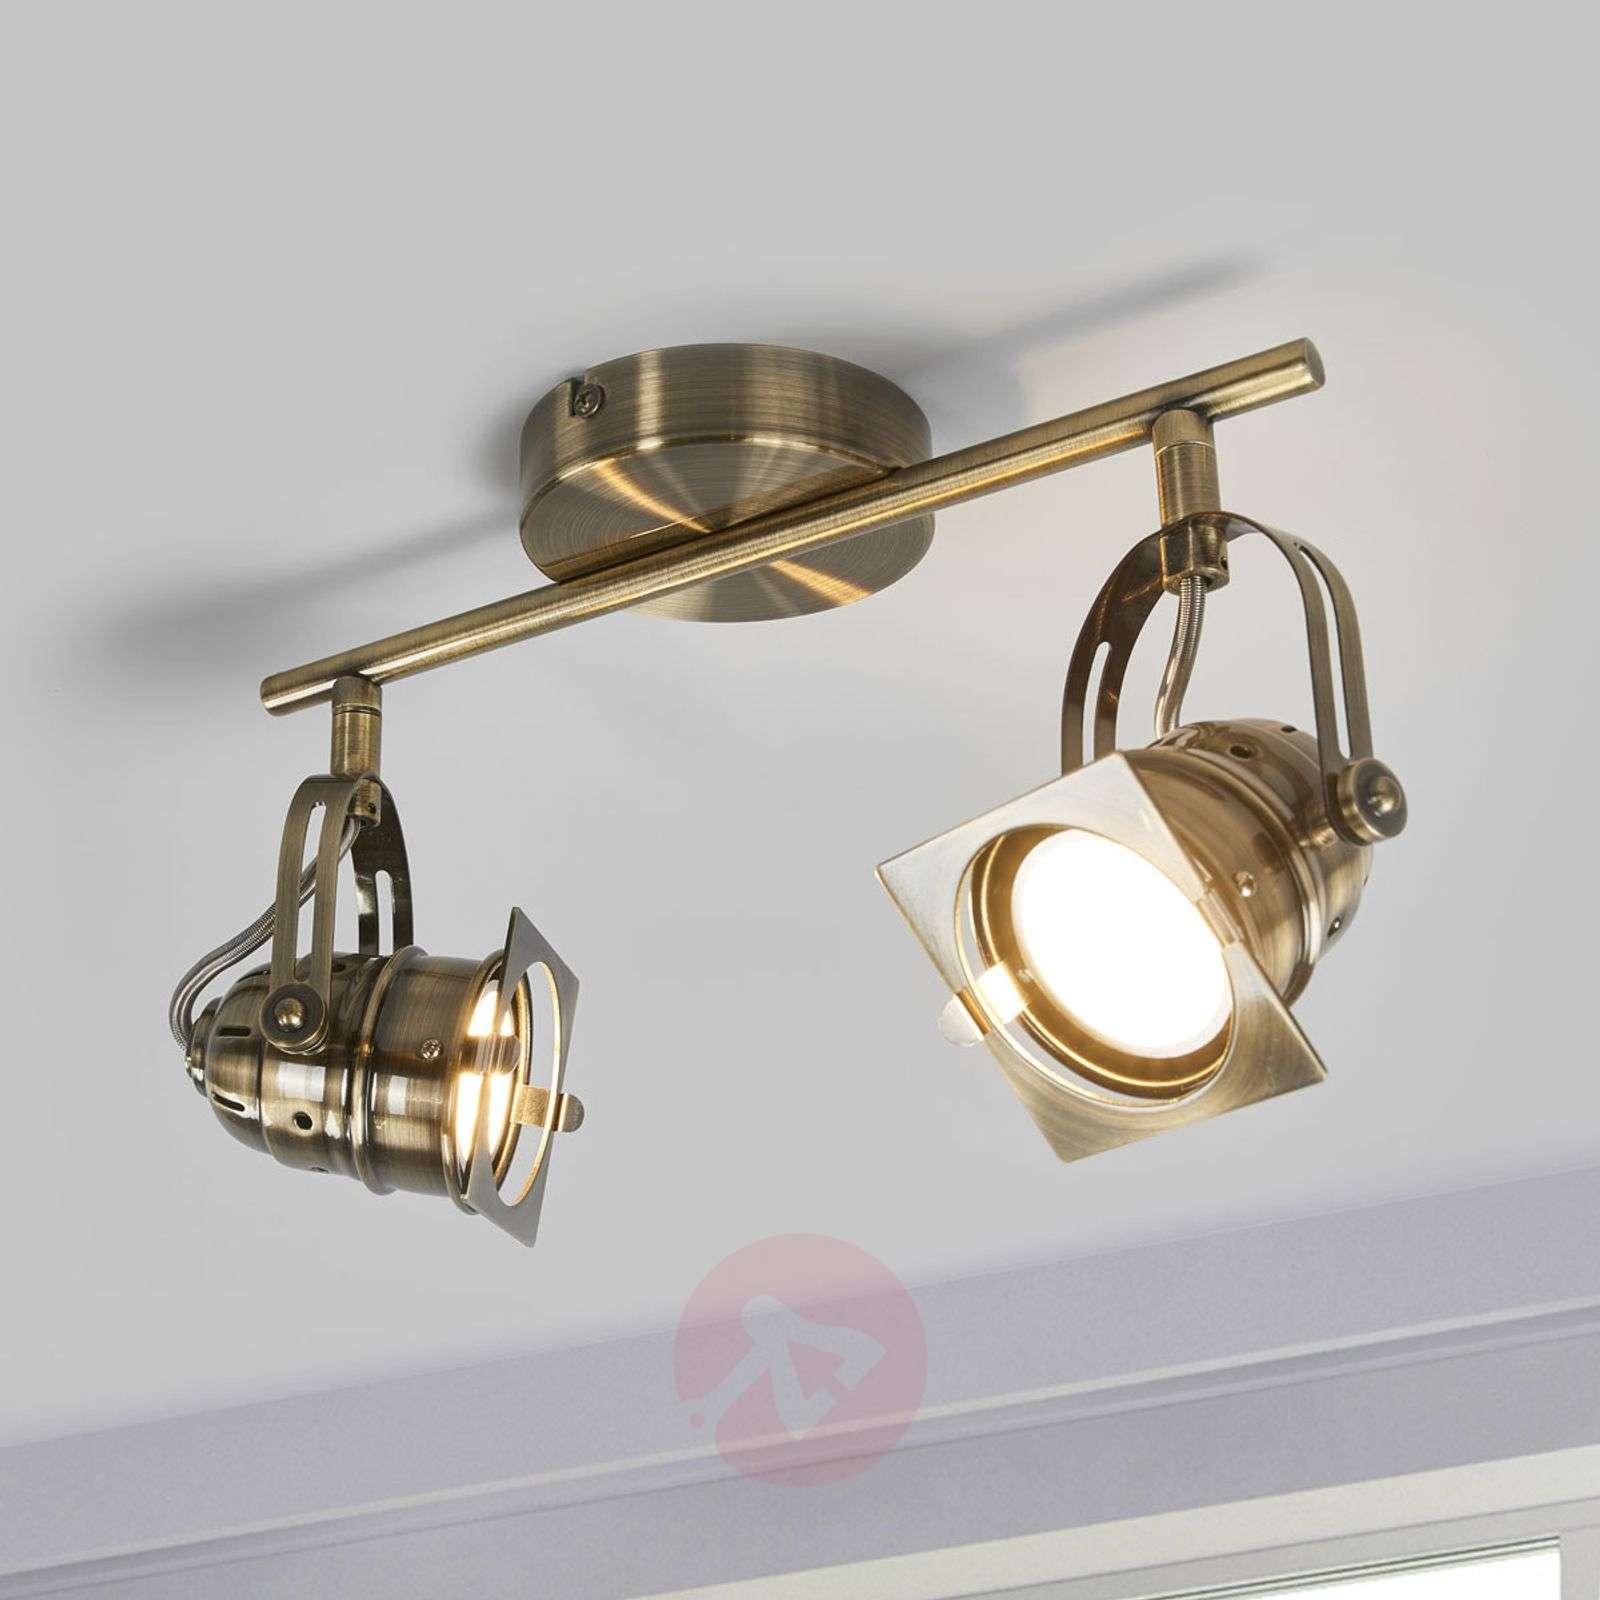 Antique-brass-coloured LED ceiling lamp Janek-9639078-01